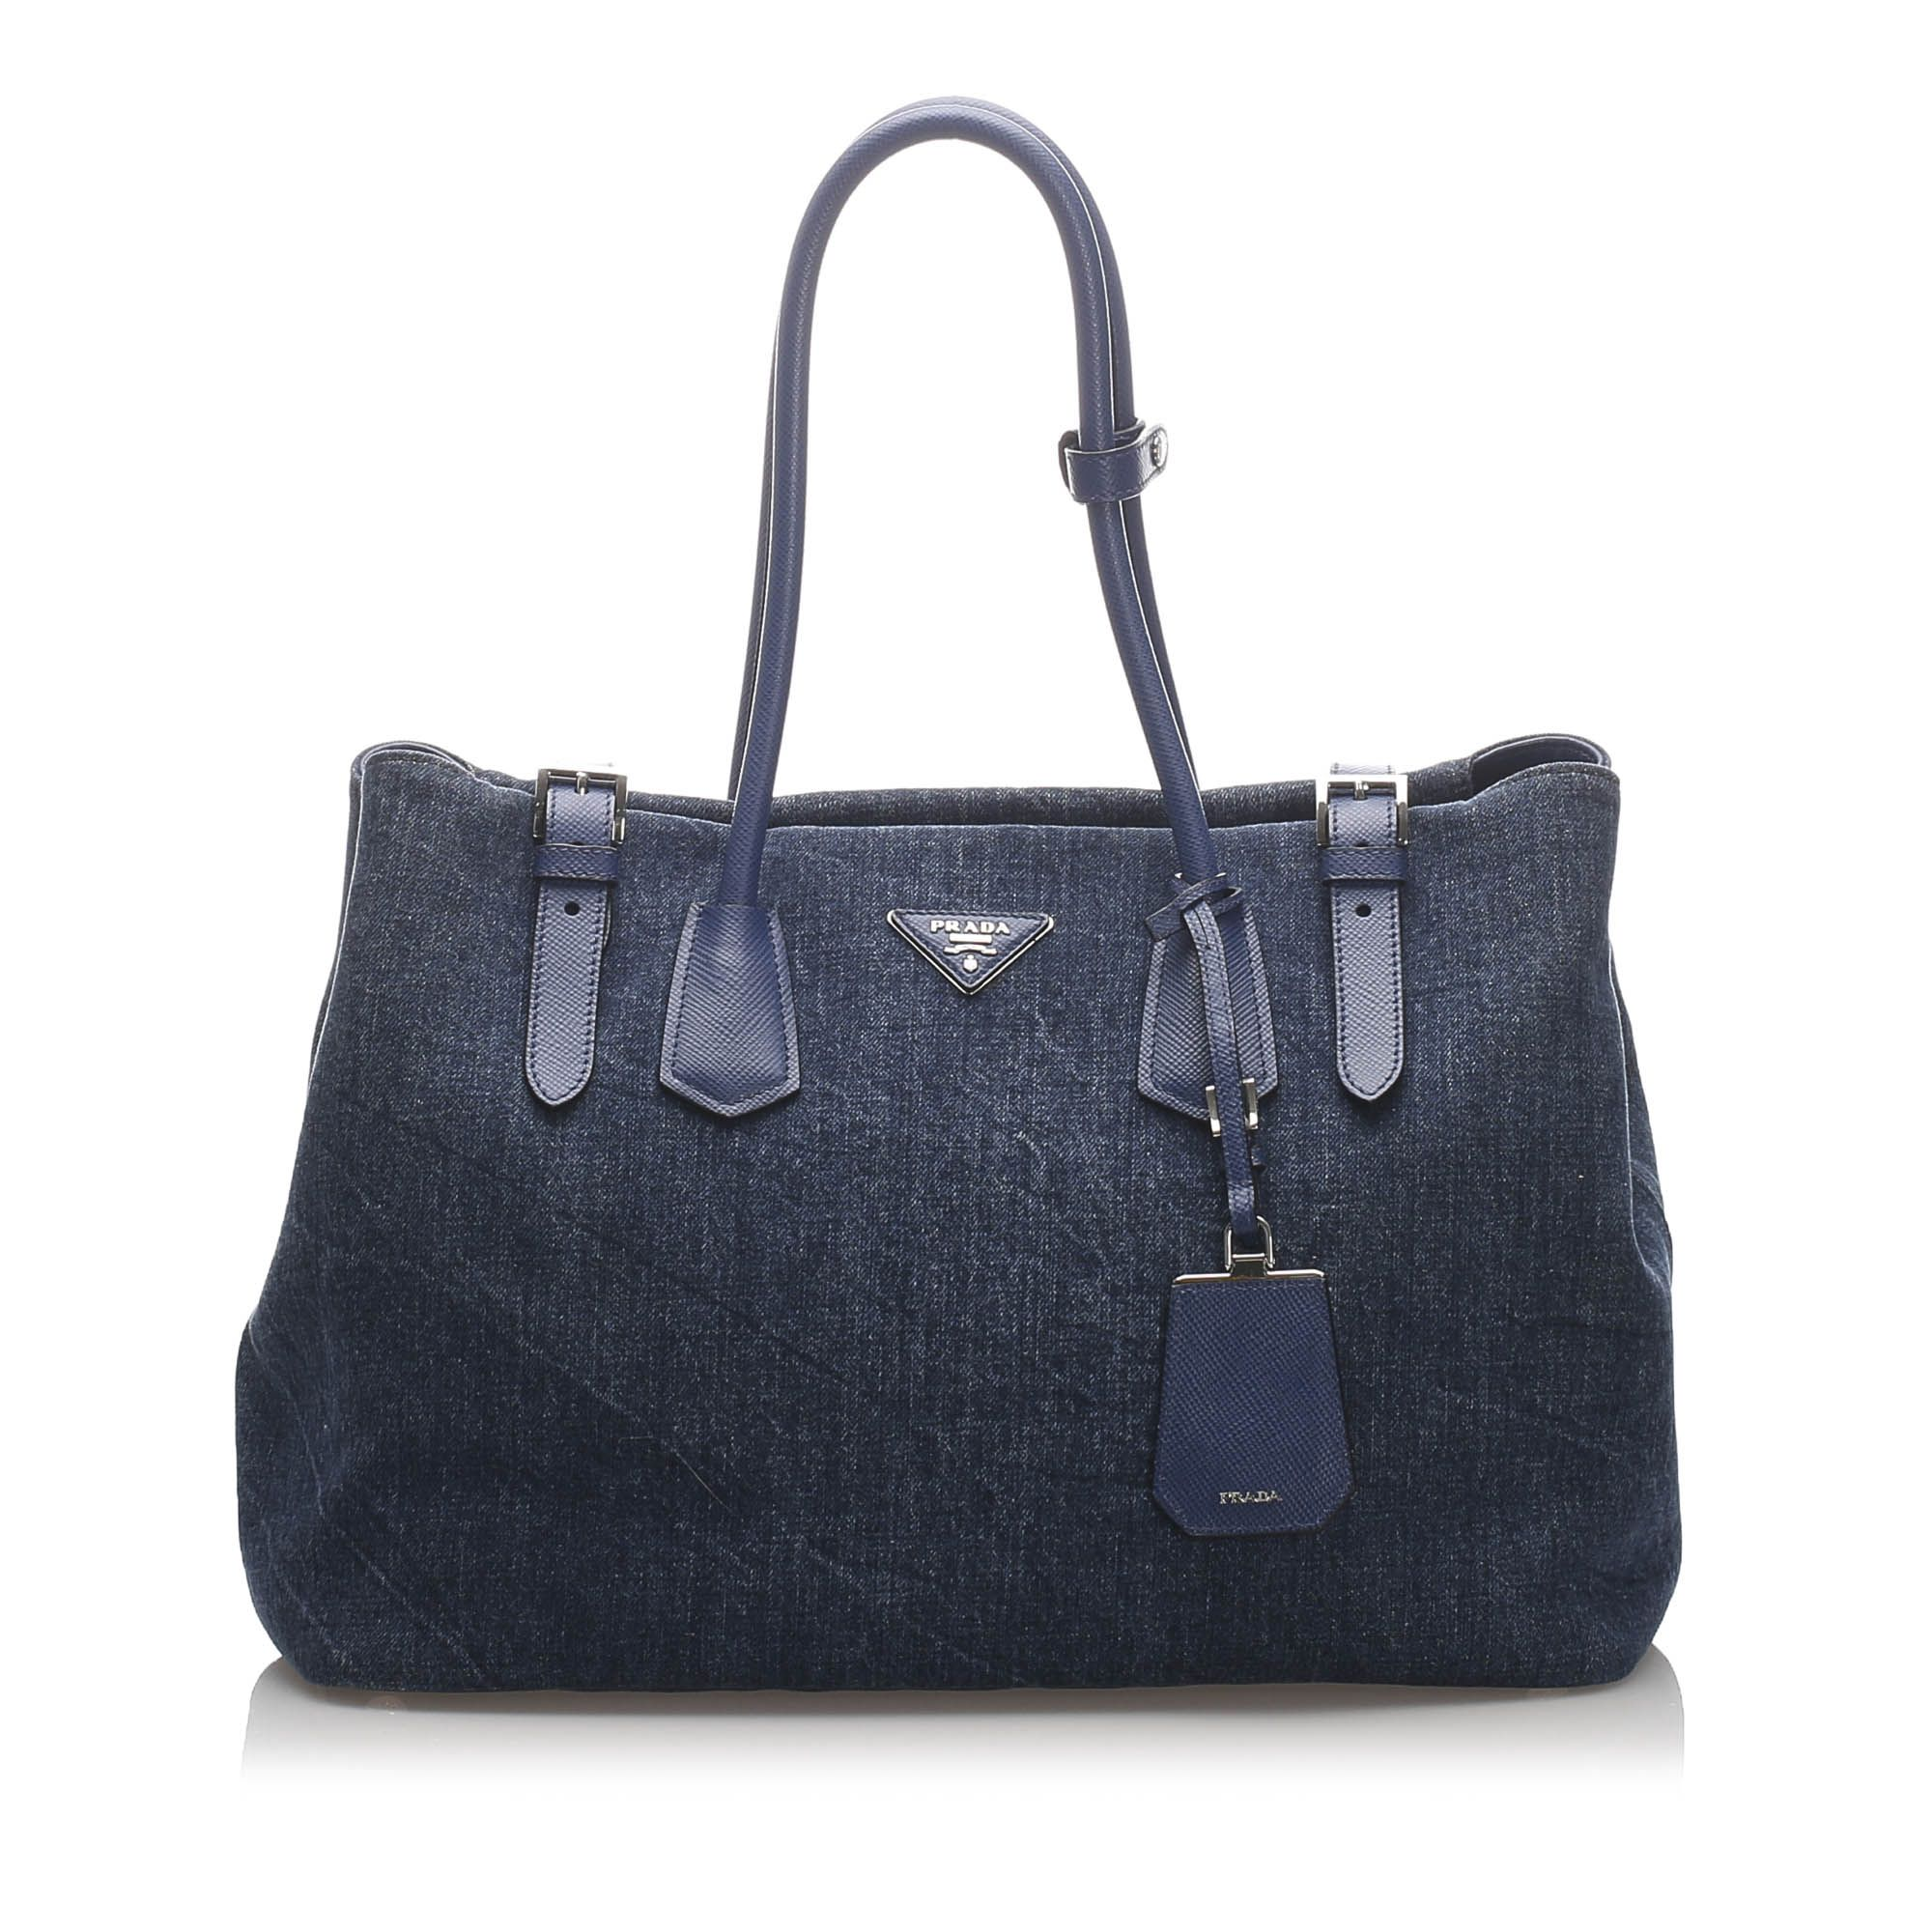 Vintage Prada Denim Tote Bag Blue